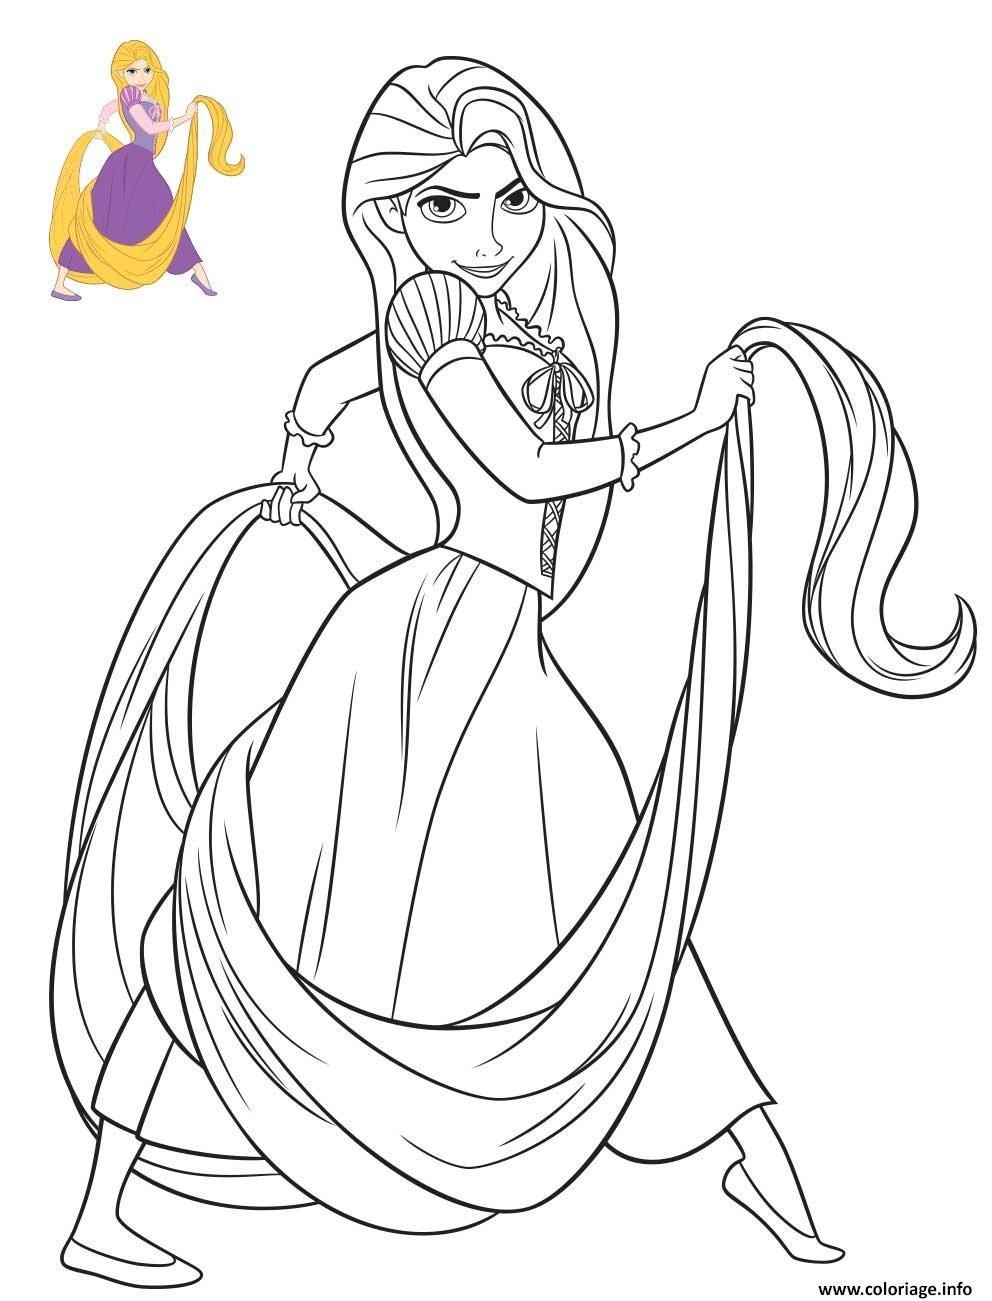 Coloriage Princesse Disney Raiponce Dessin De Disney A Imprimer